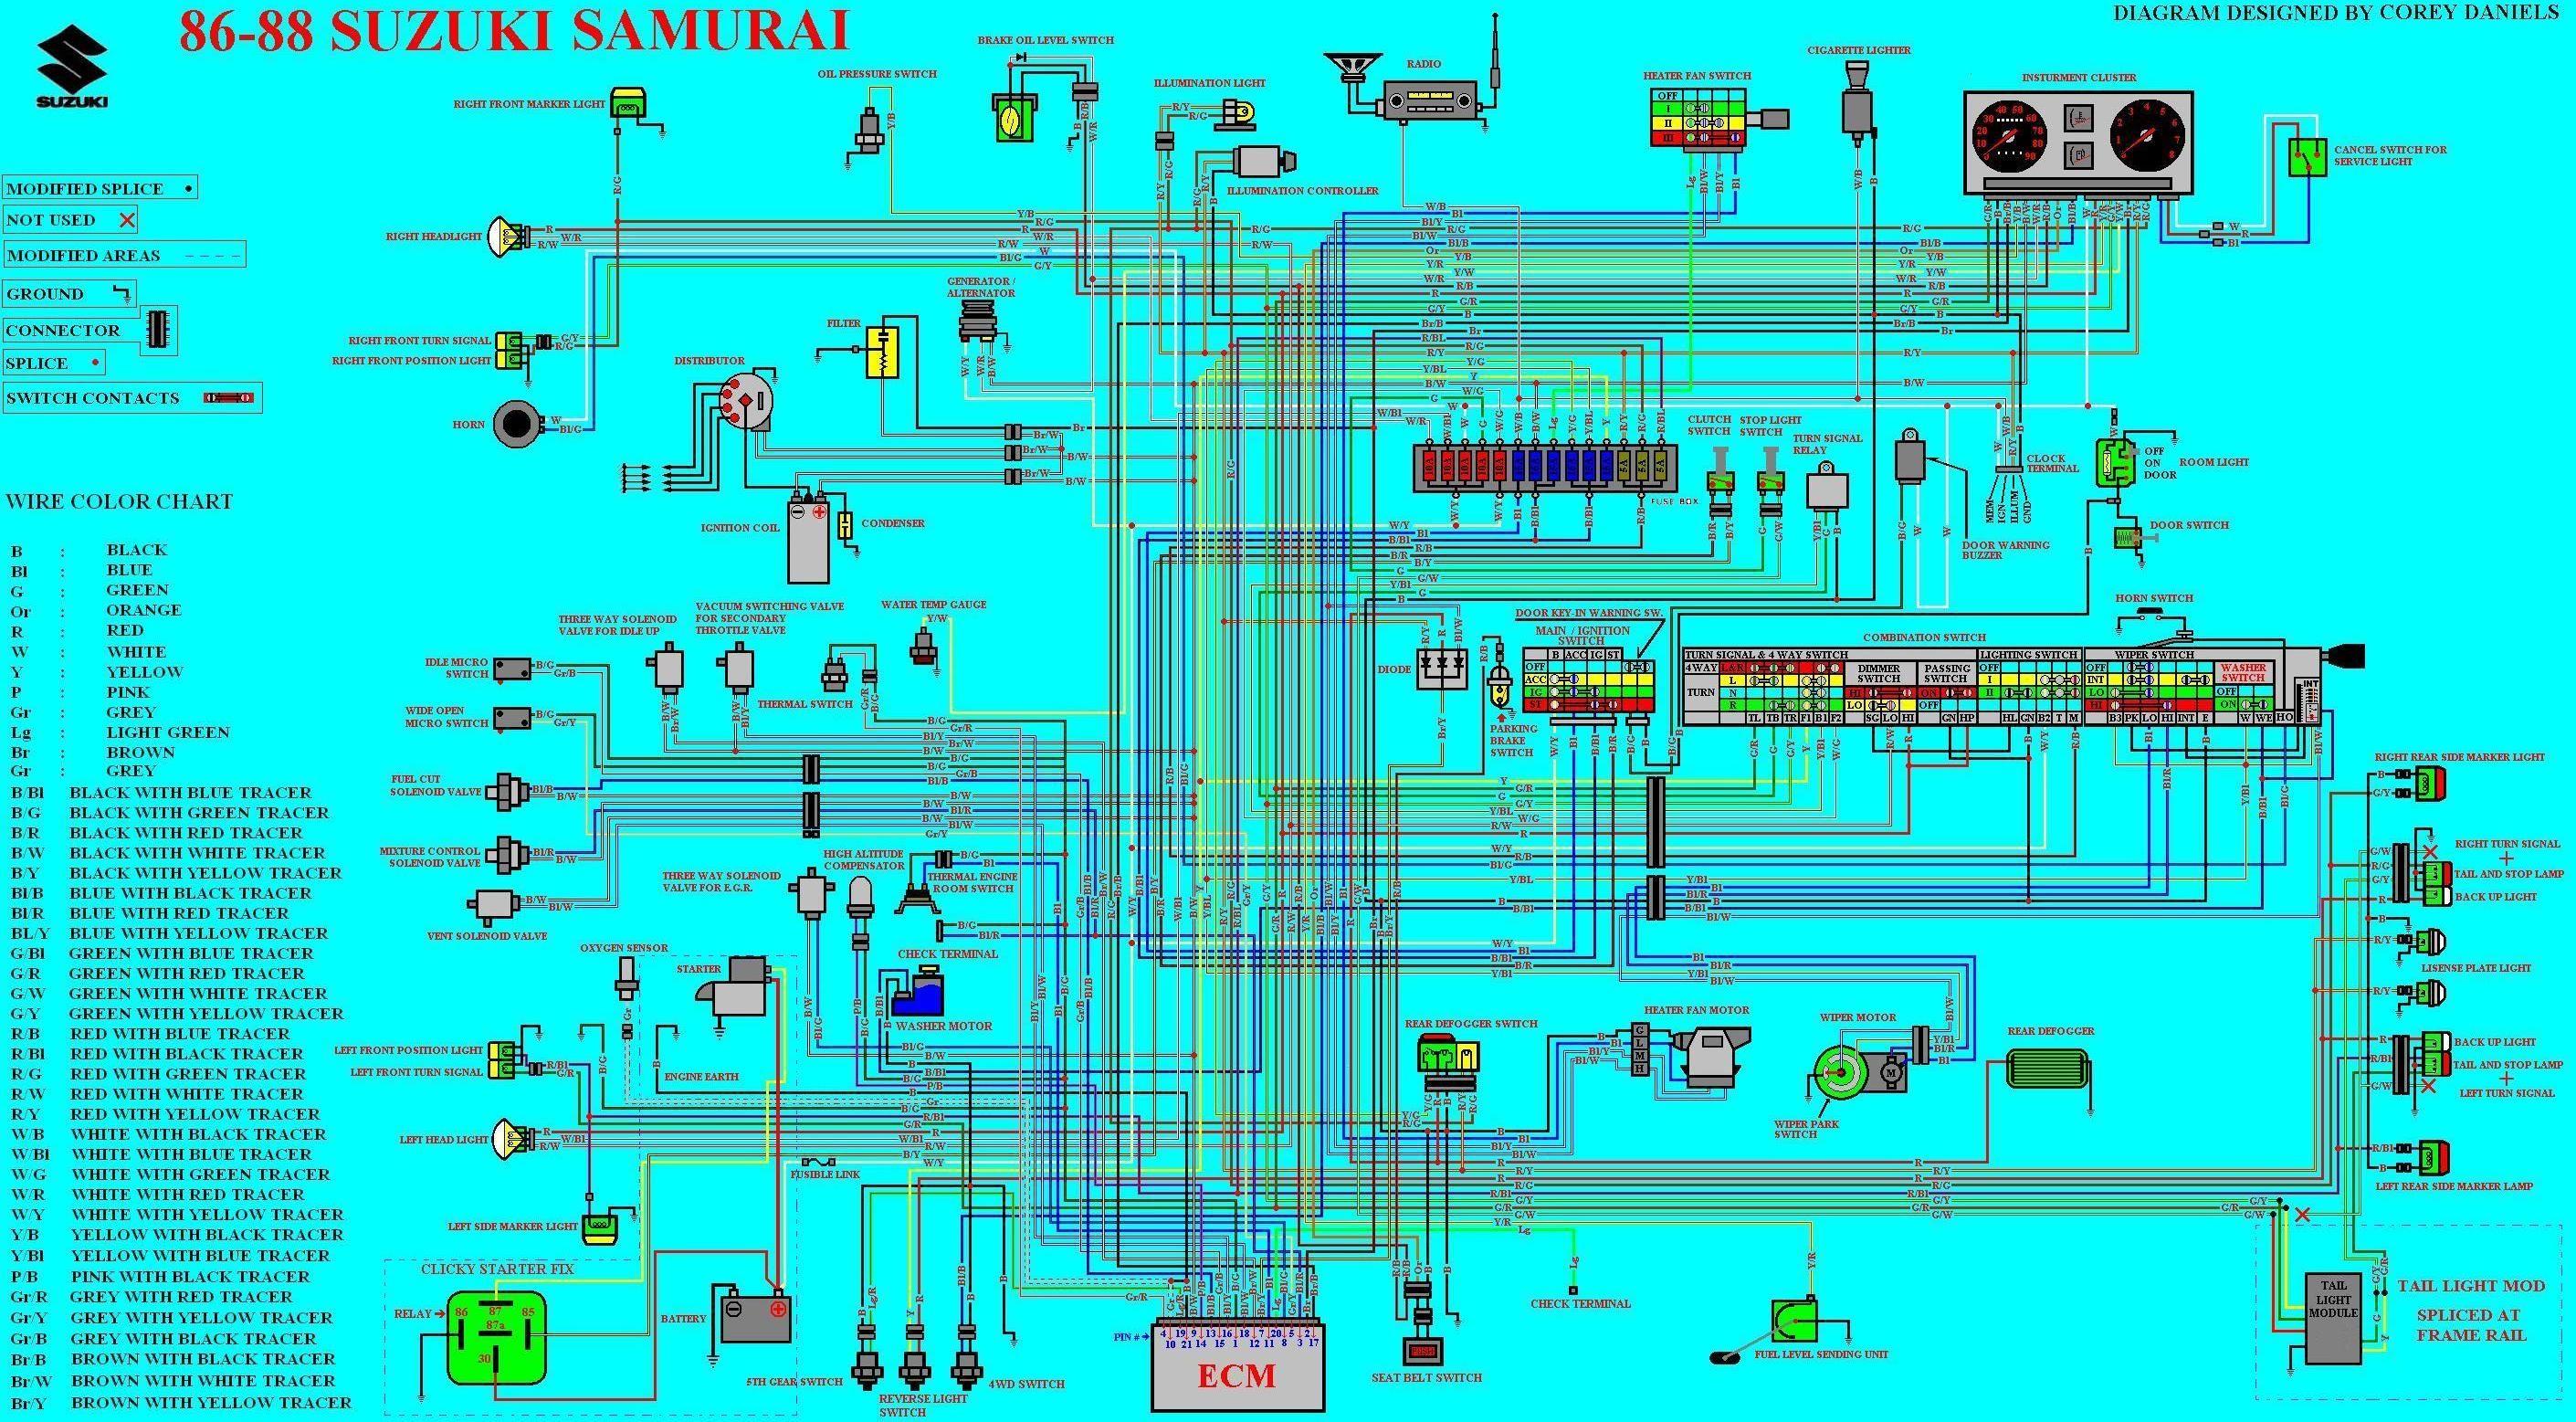 suzuki sidekick wiring diagram 2006 f150 5 4 86 88 samurai cars i love